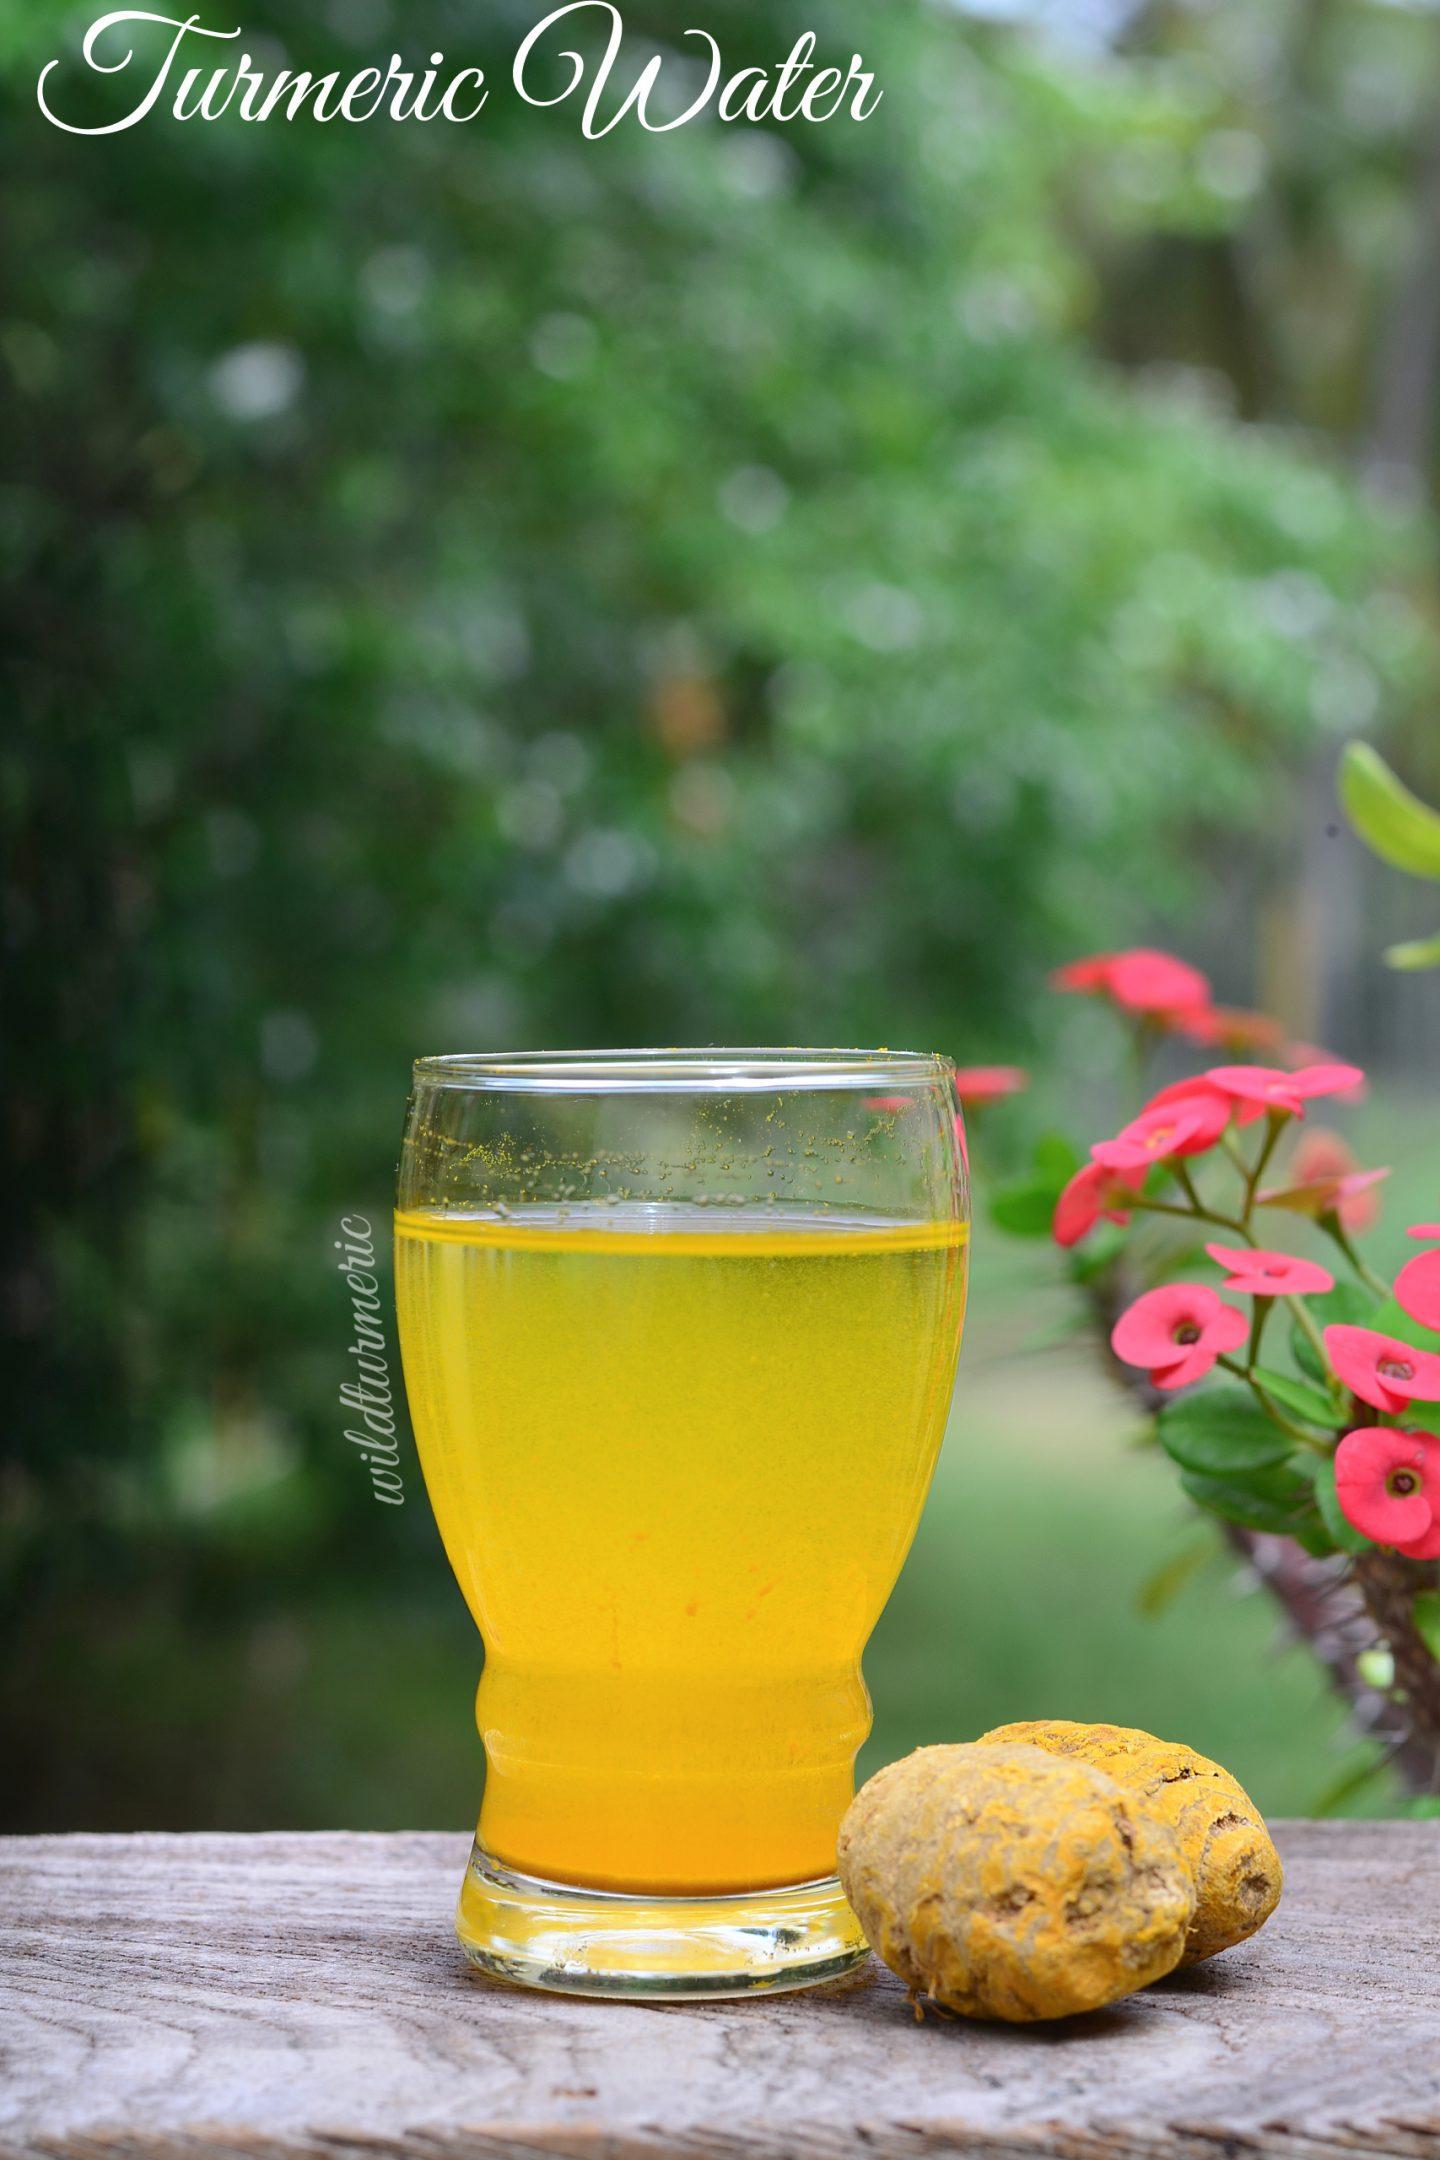 turmeric water benefits